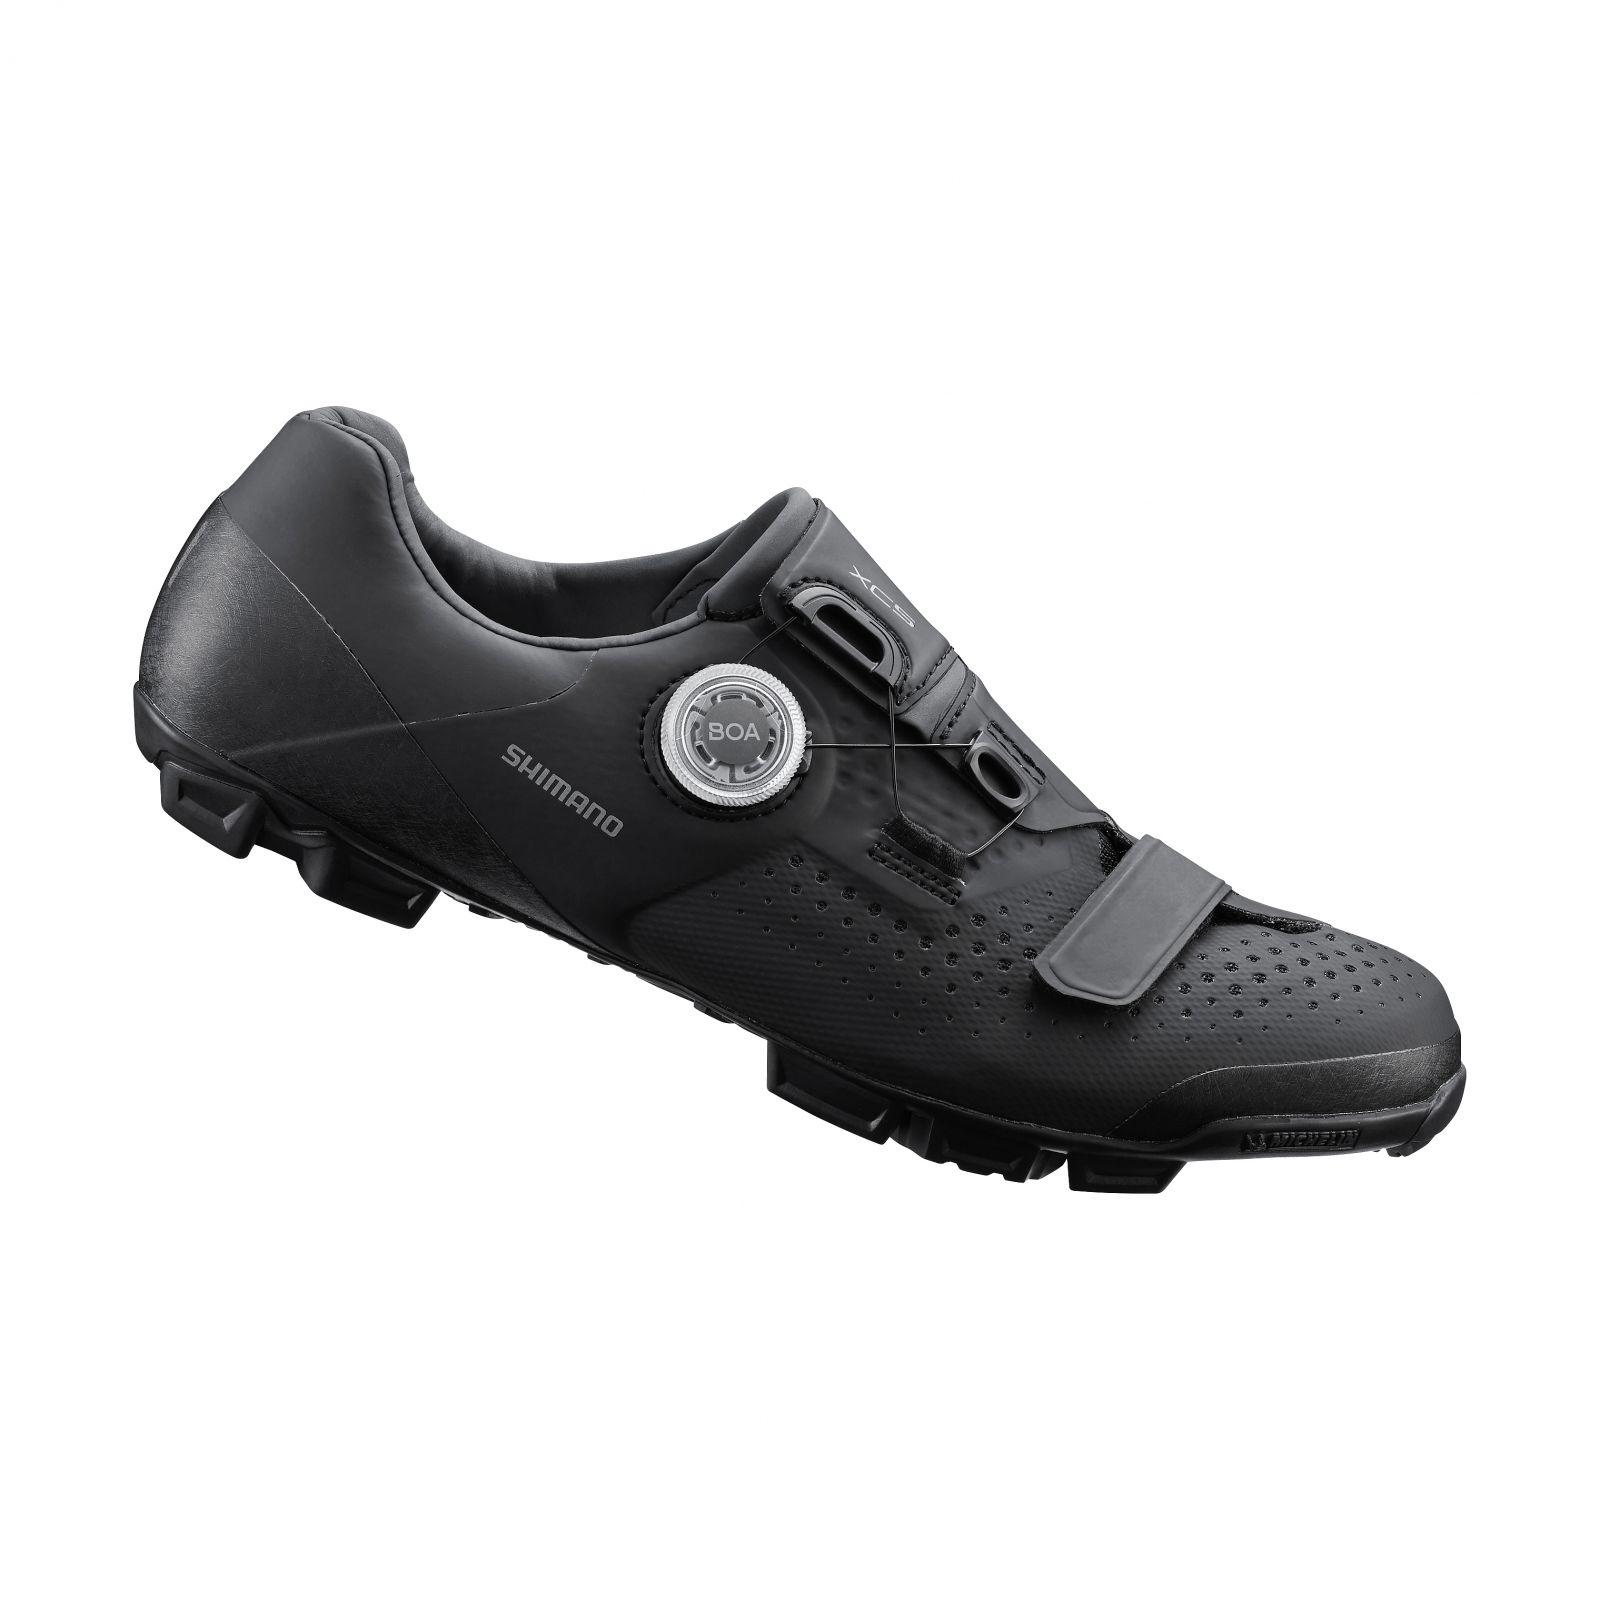 SHIMANO MTB obuv SH-XC501ML, černá, 47